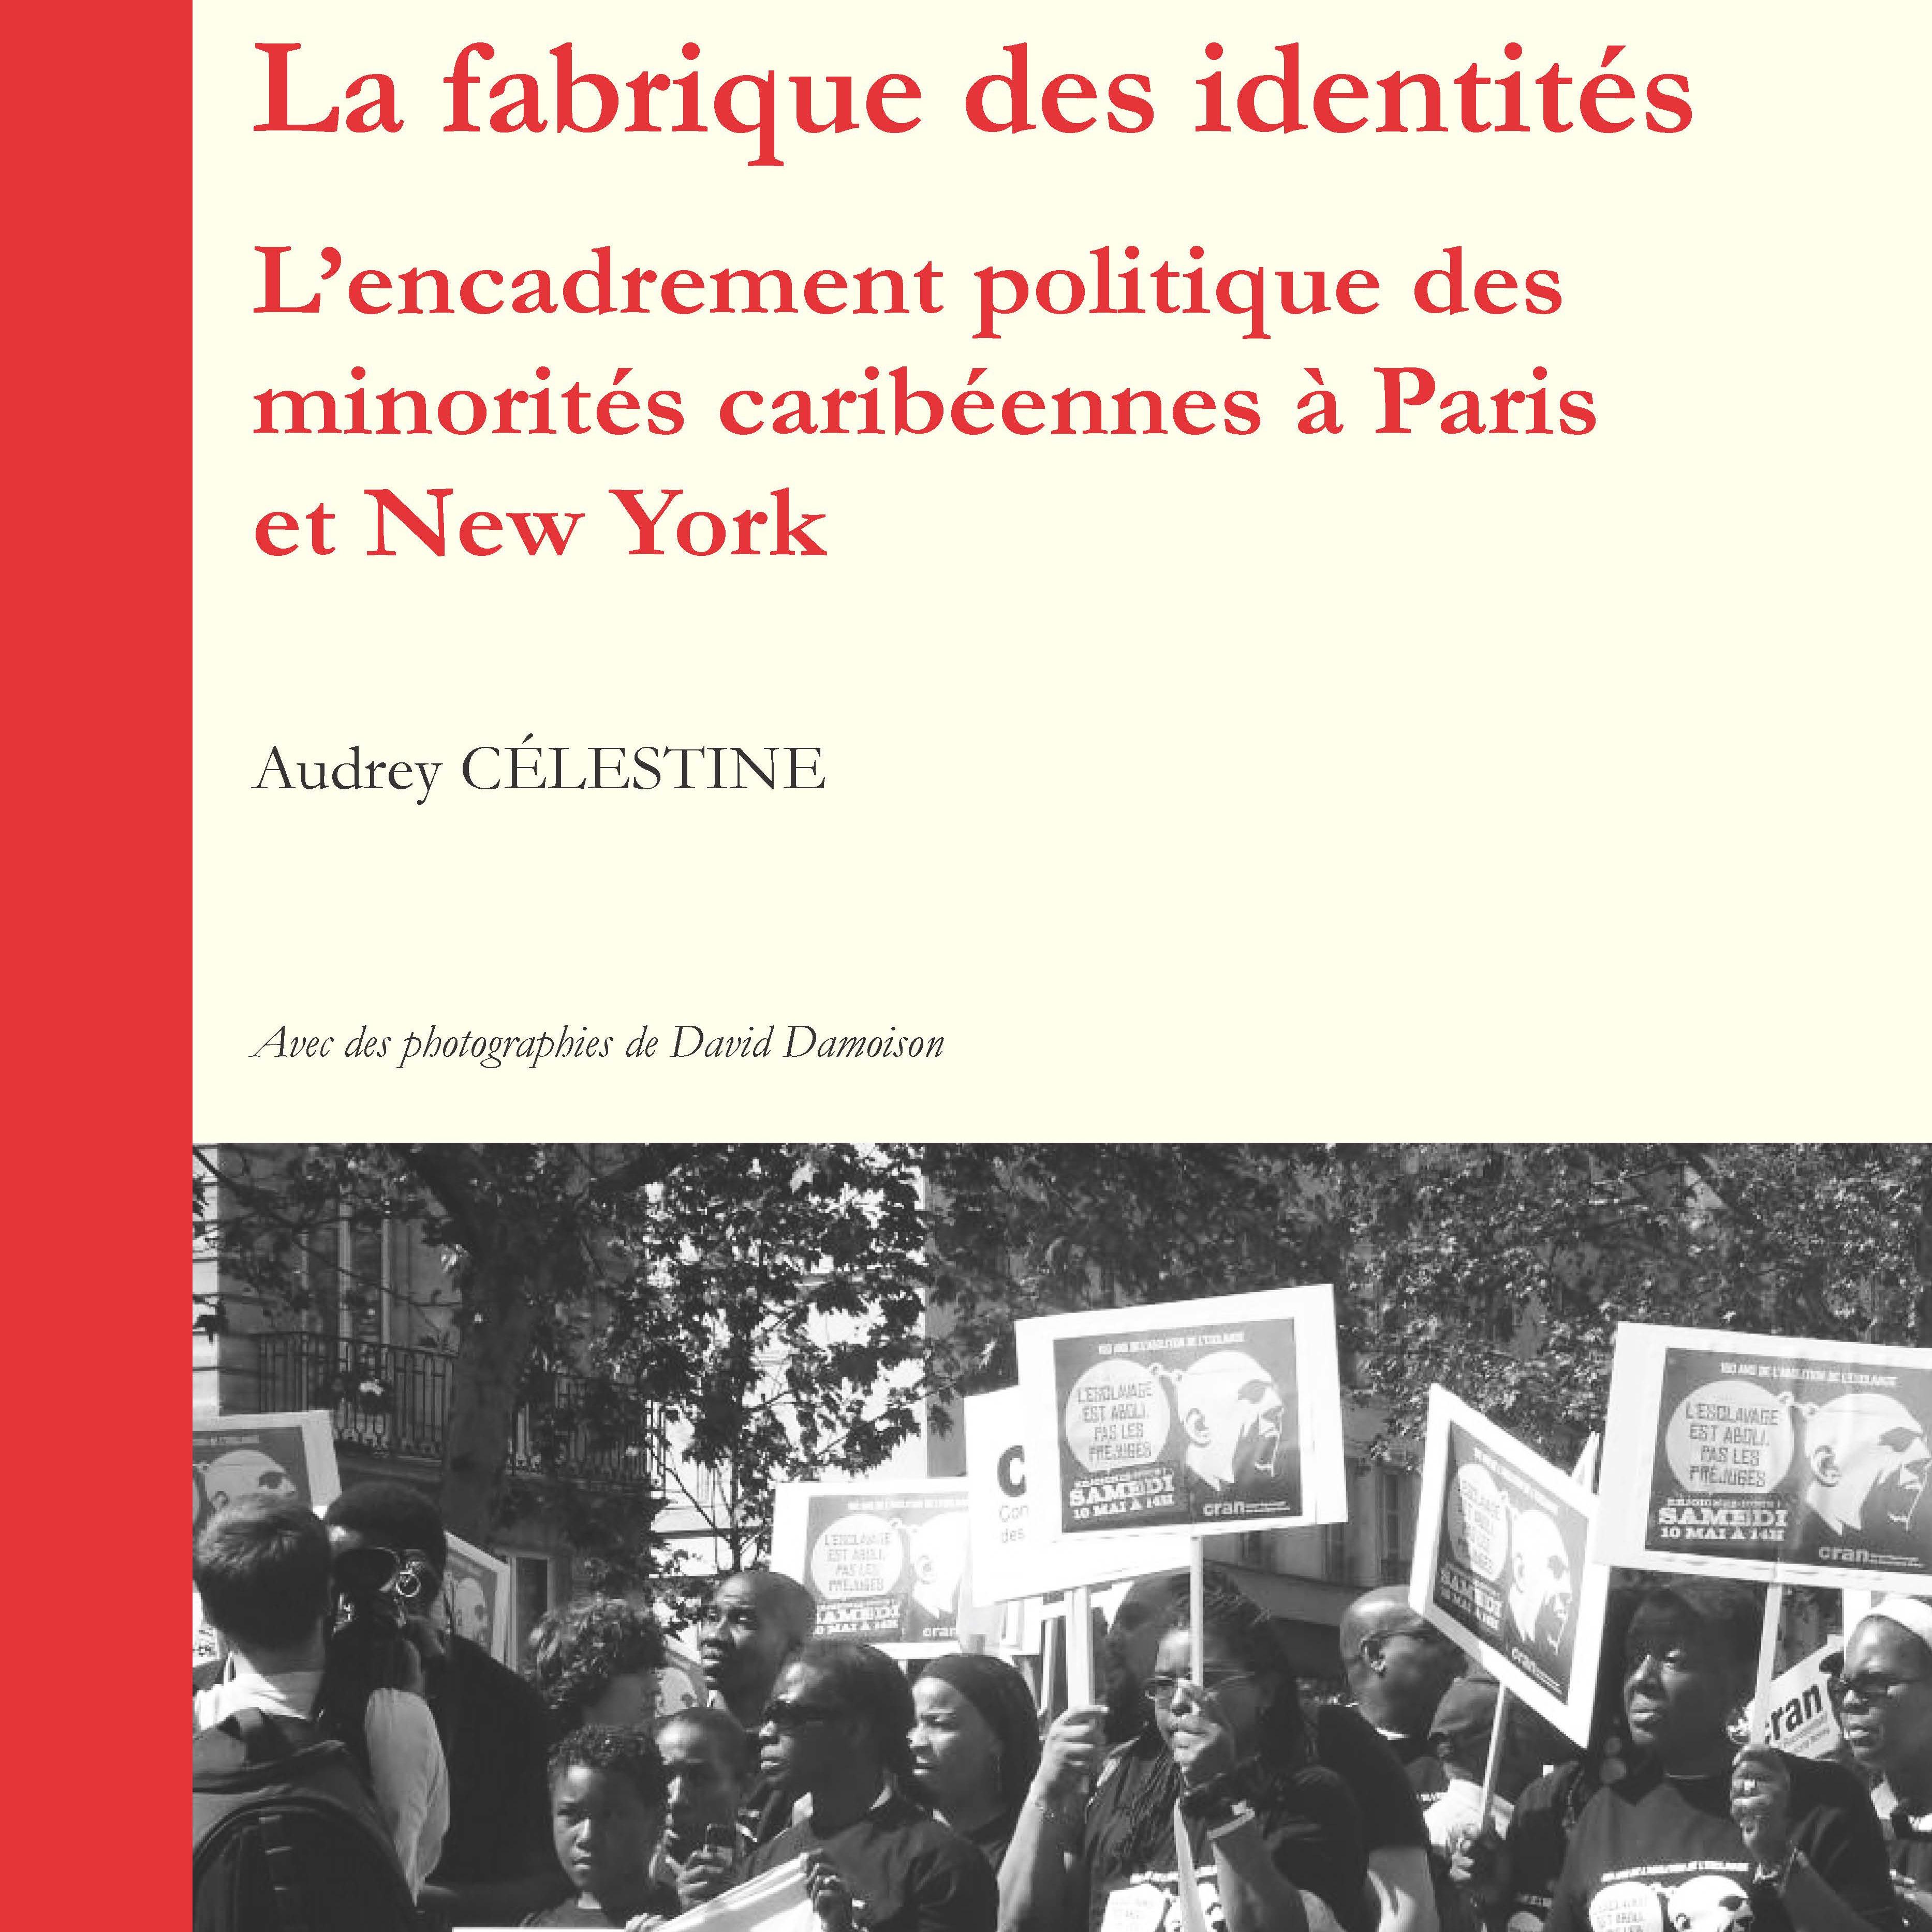 5 Minorités   Cairn.info